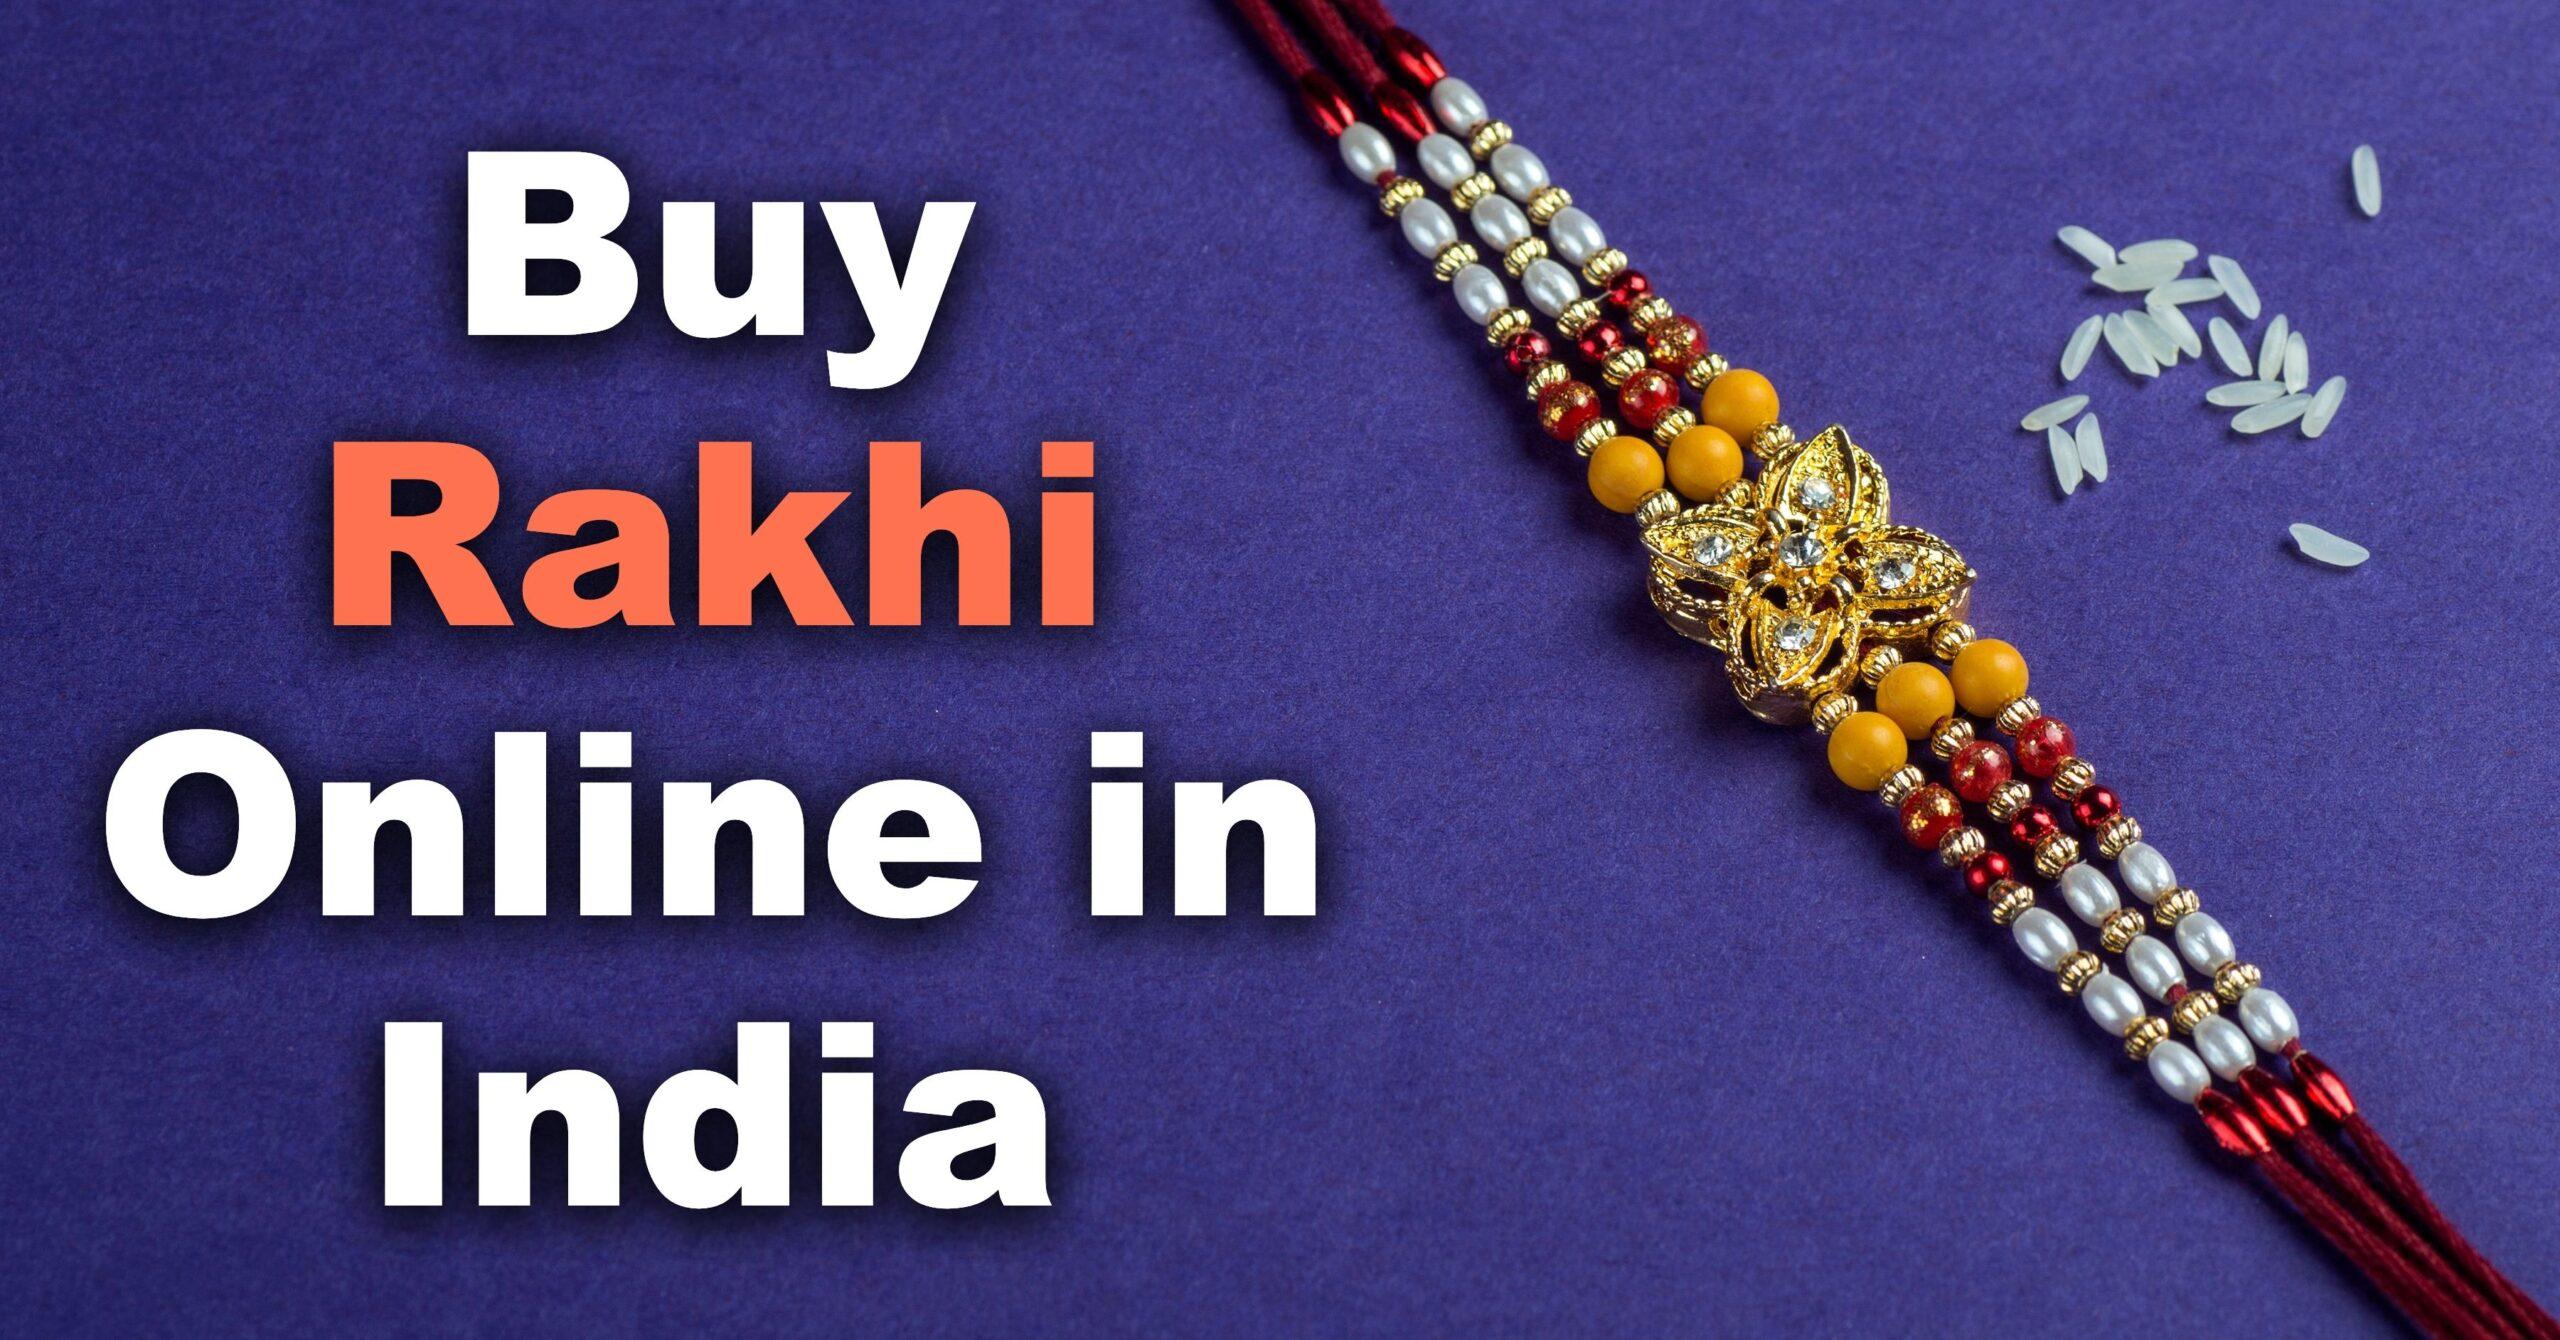 Buy Rakhi Online in India